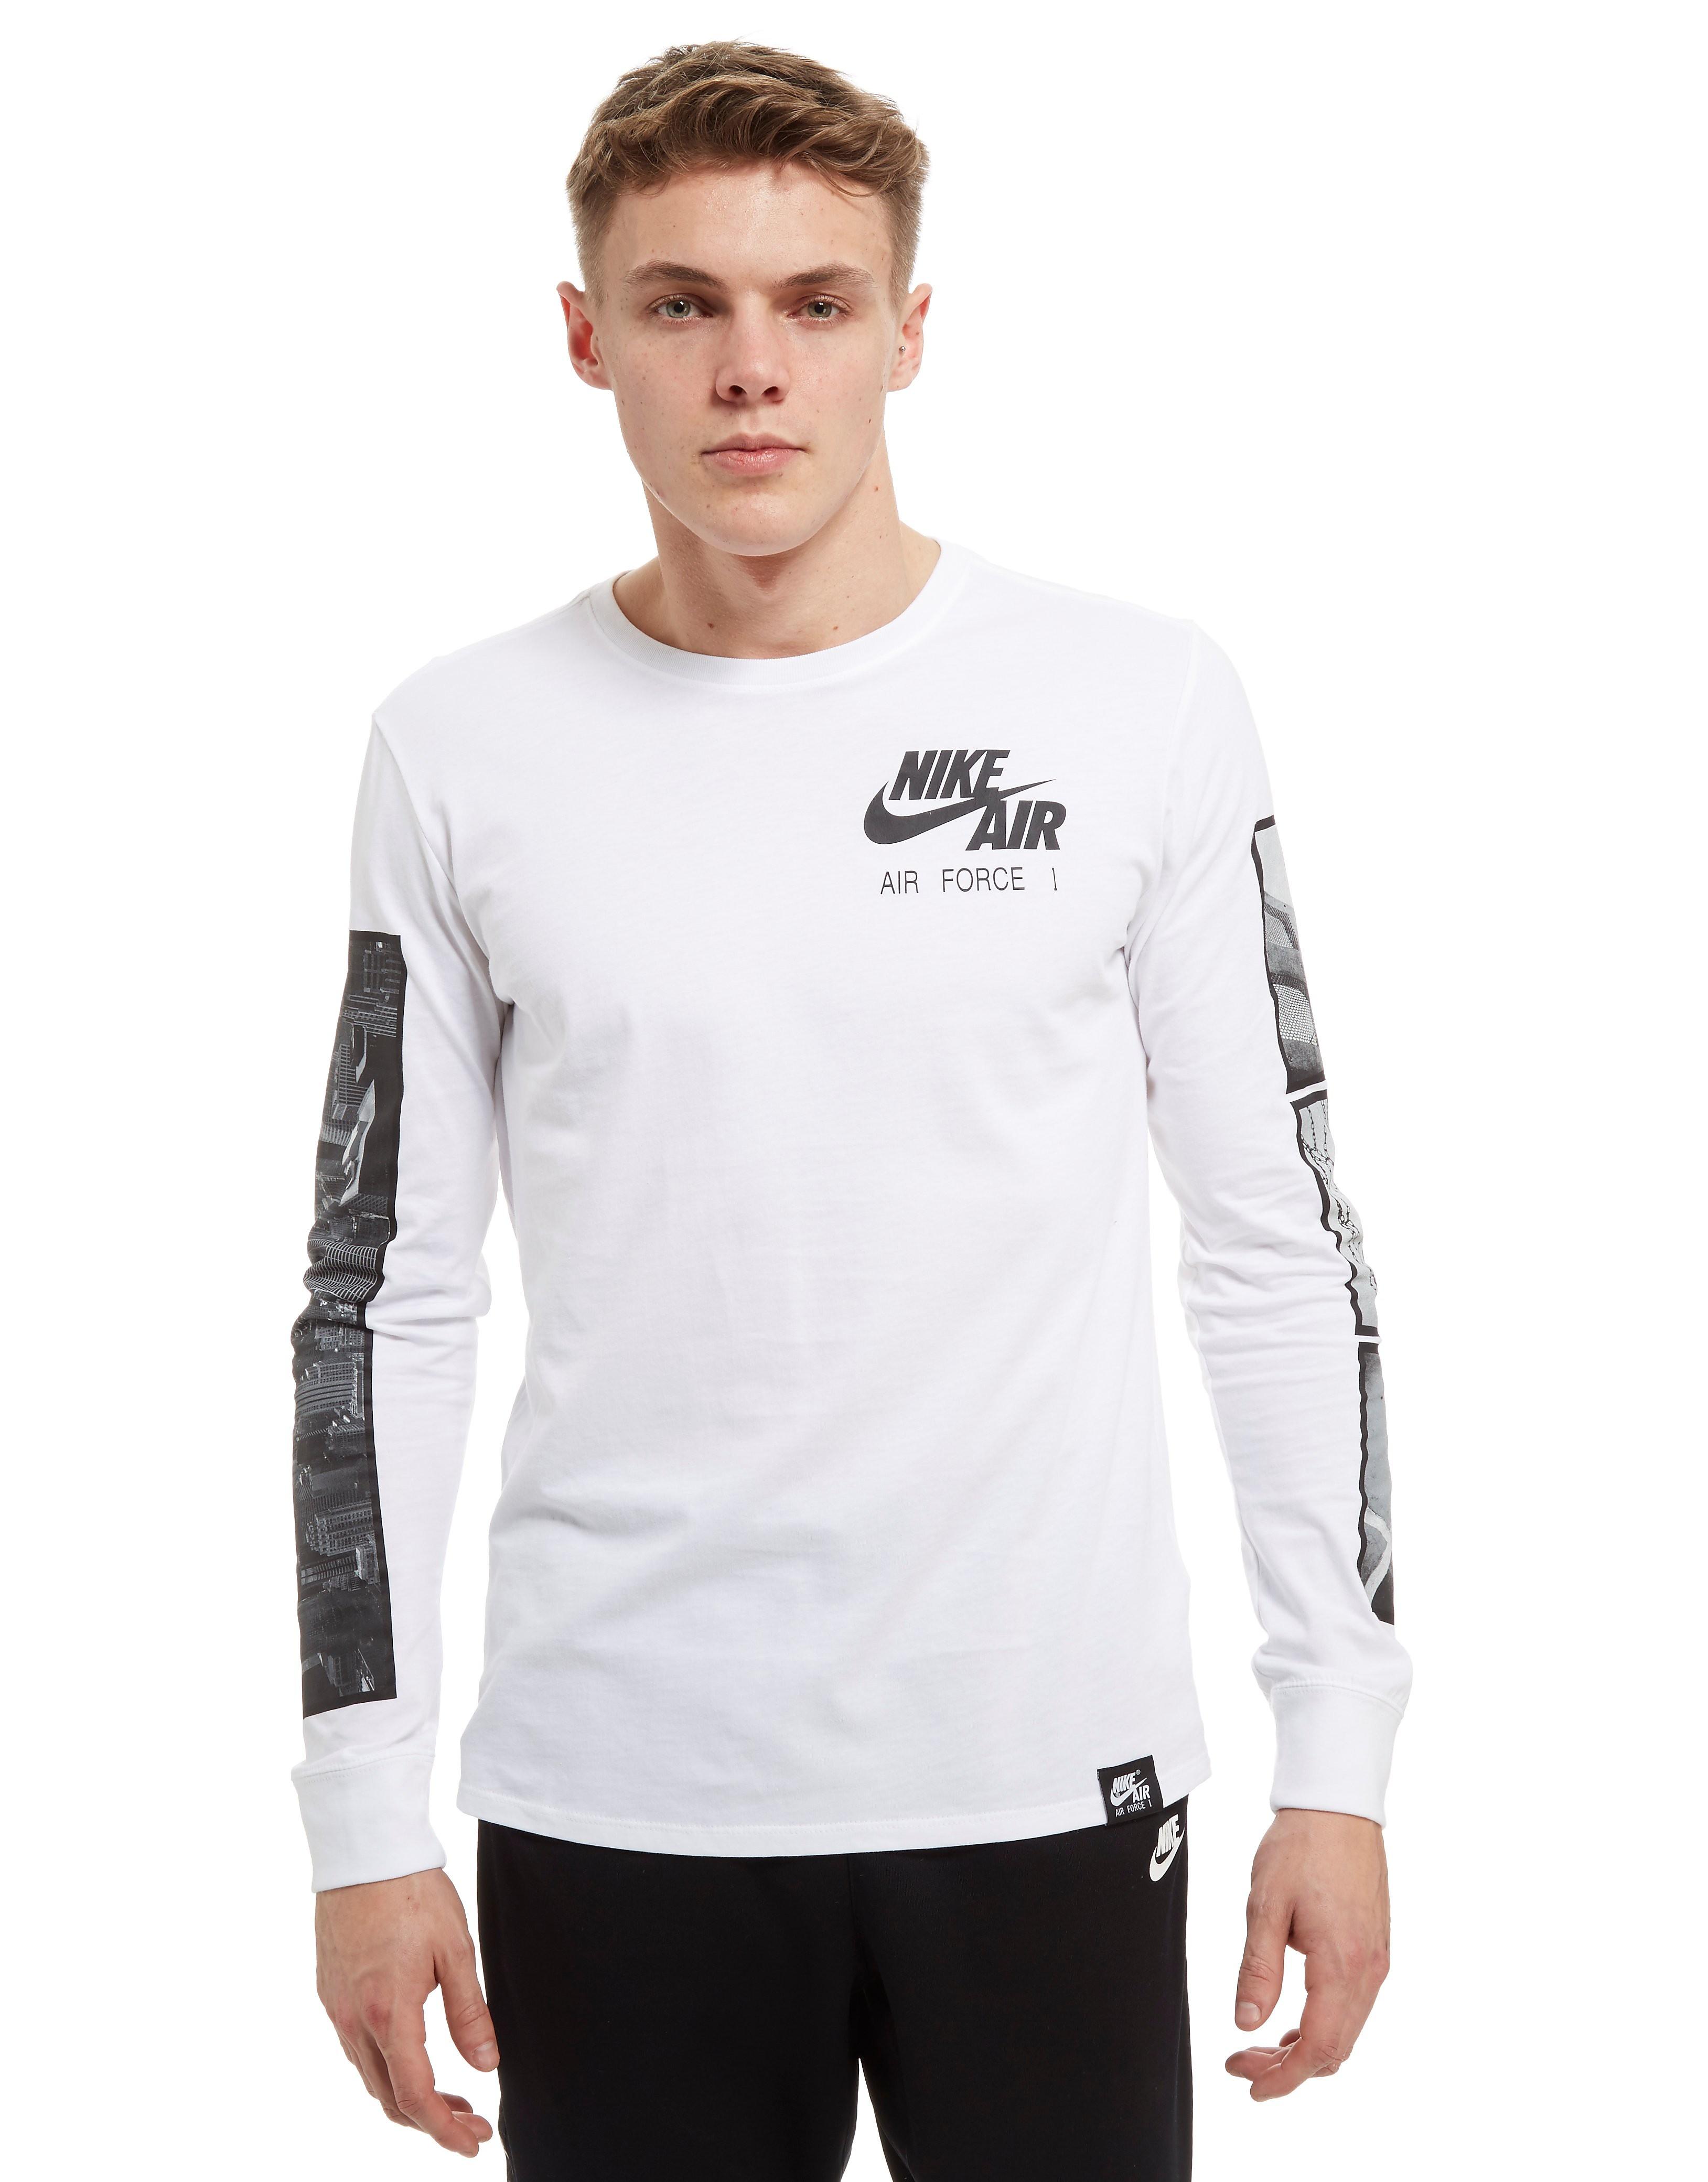 Nike Air Force 1 Photo Long Sleeve T-Shirt